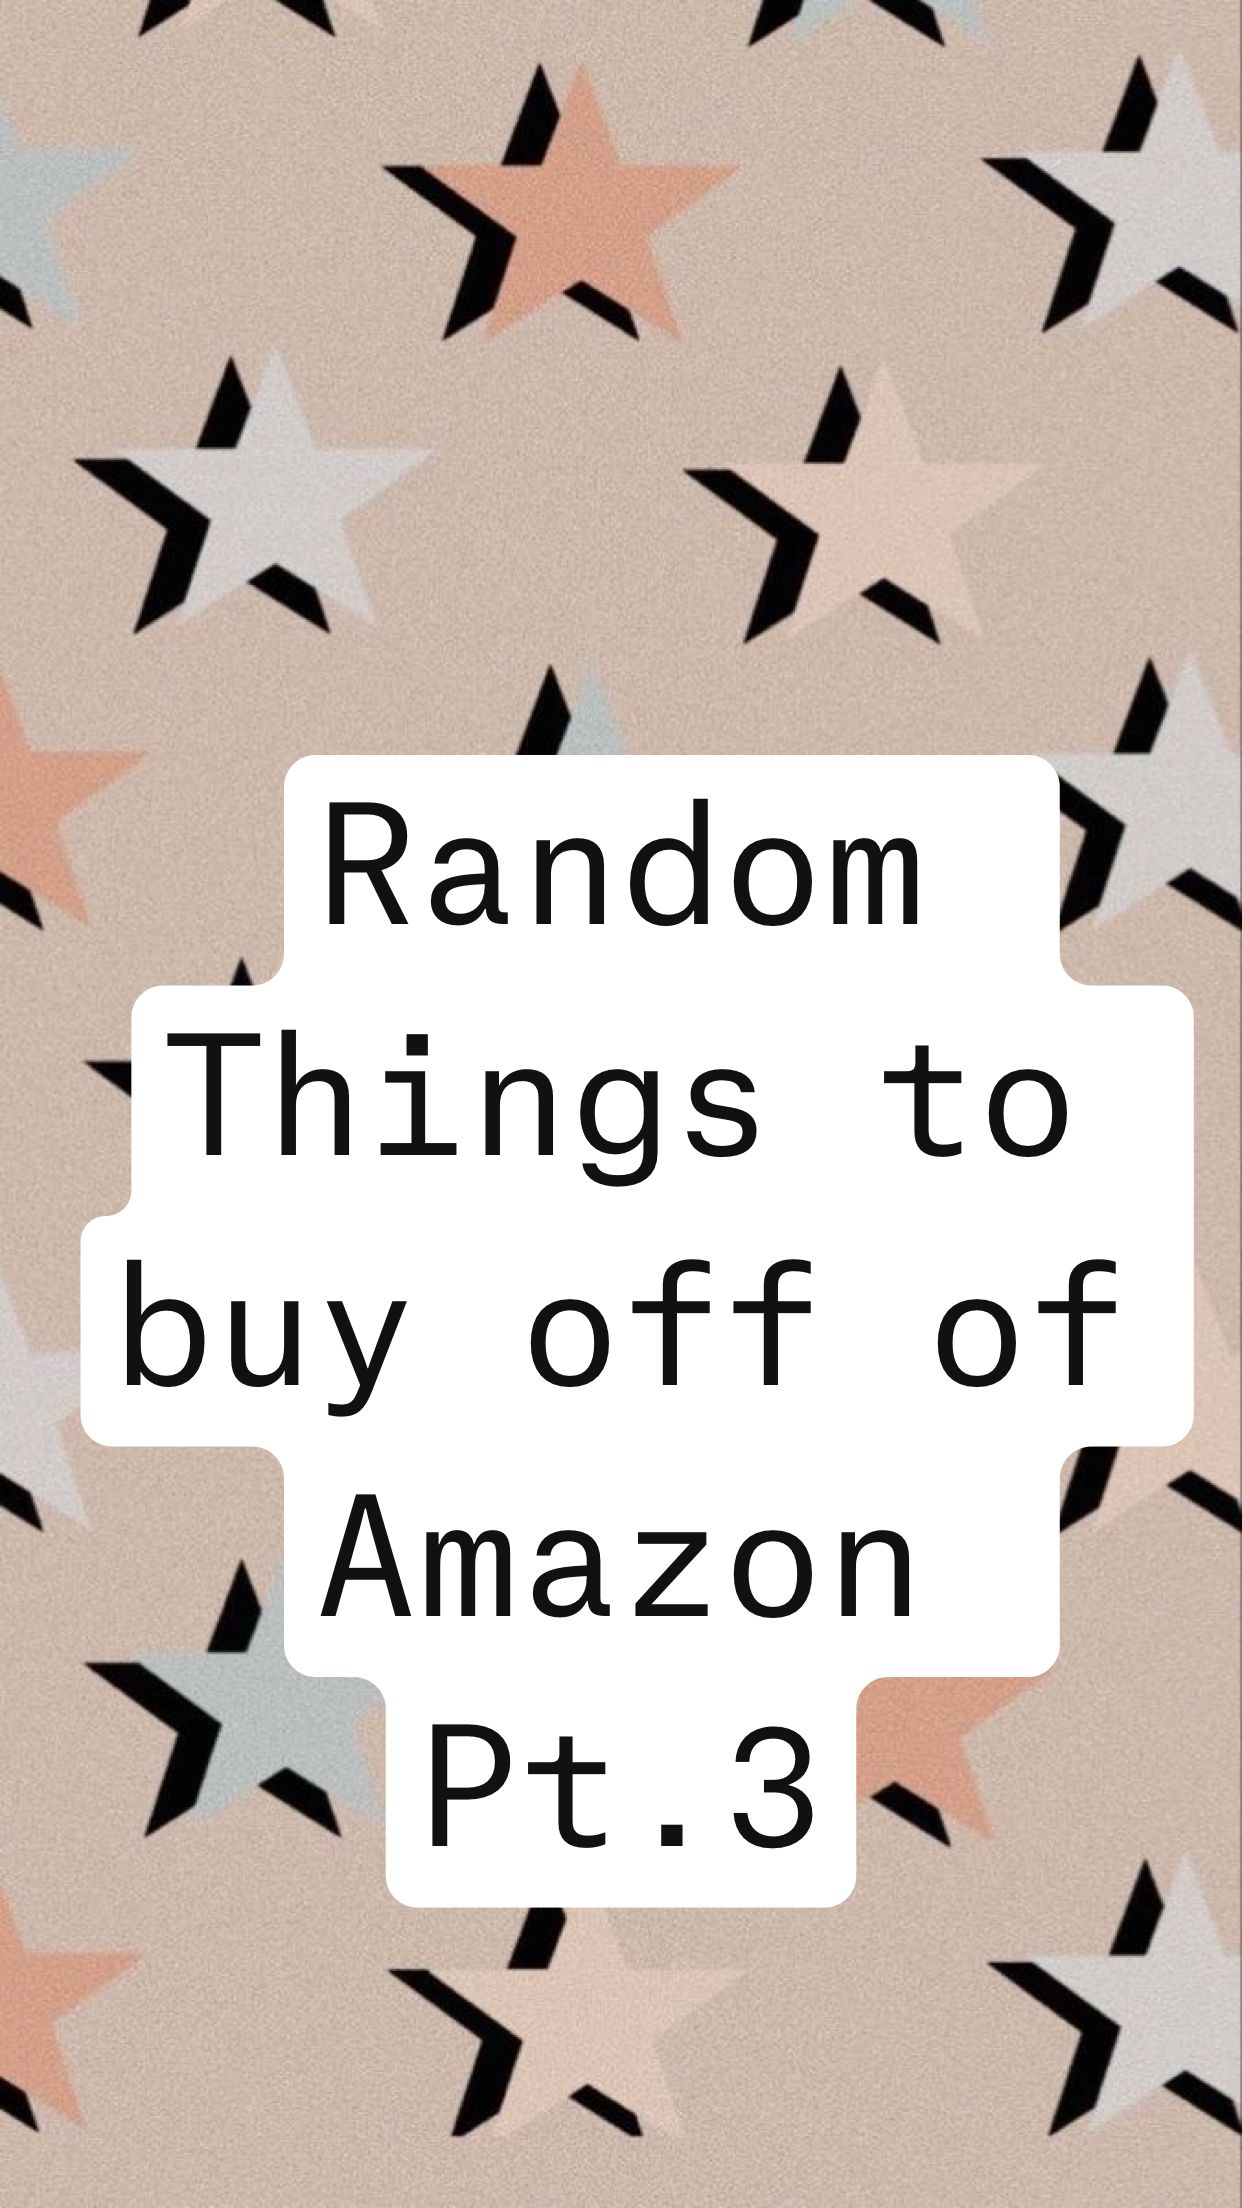 Random Things to buy off of Amazon  Pt.3